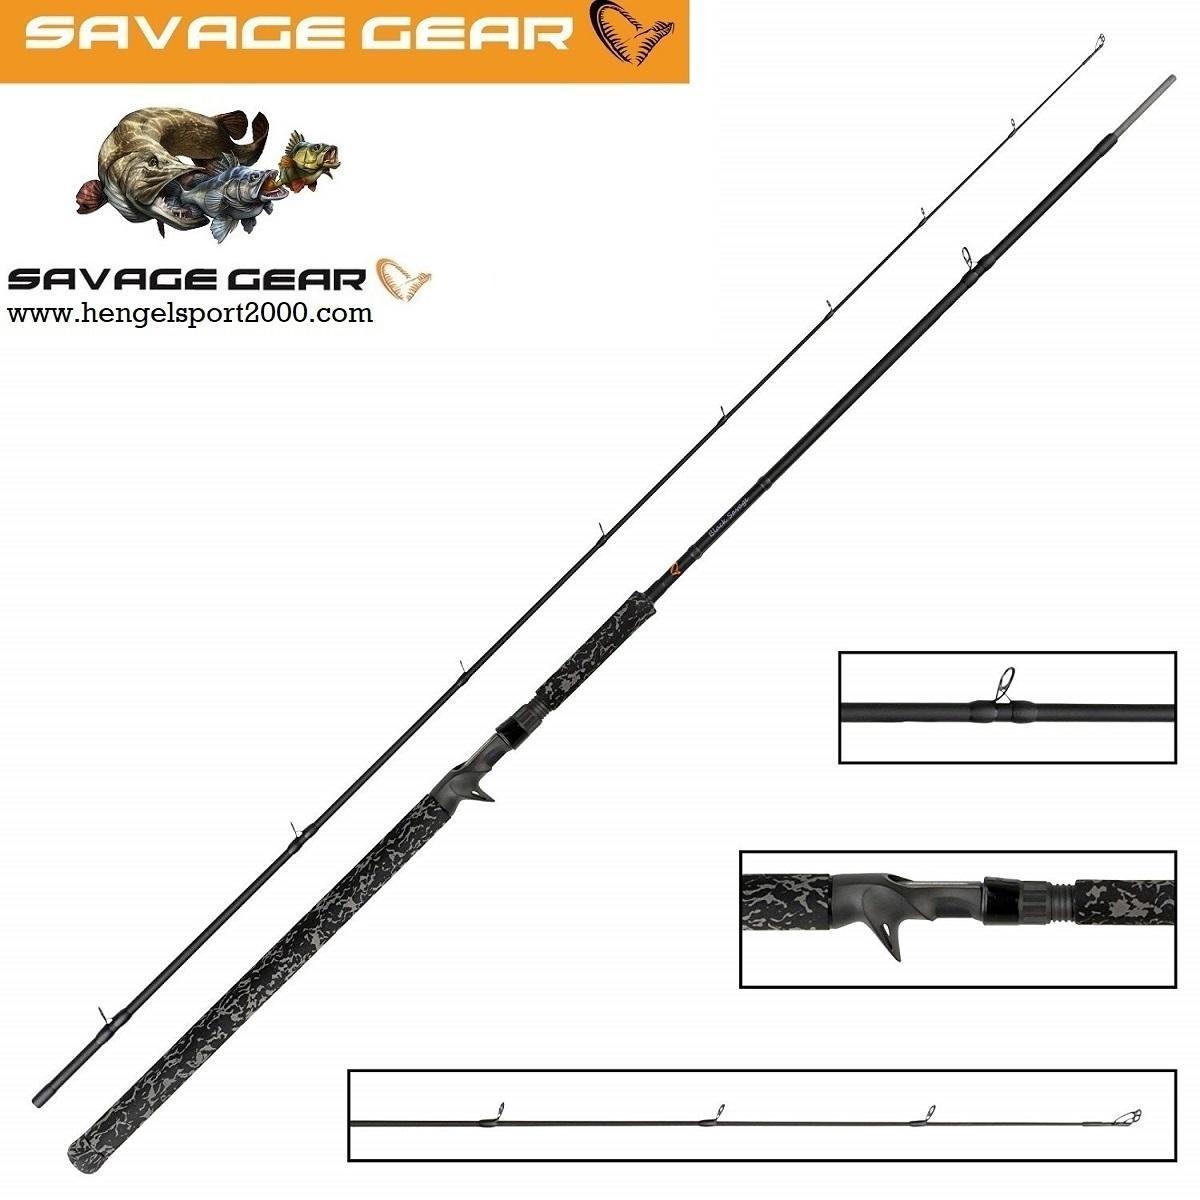 Savage Gear Black Savage Trigger 249 cm 150 gram